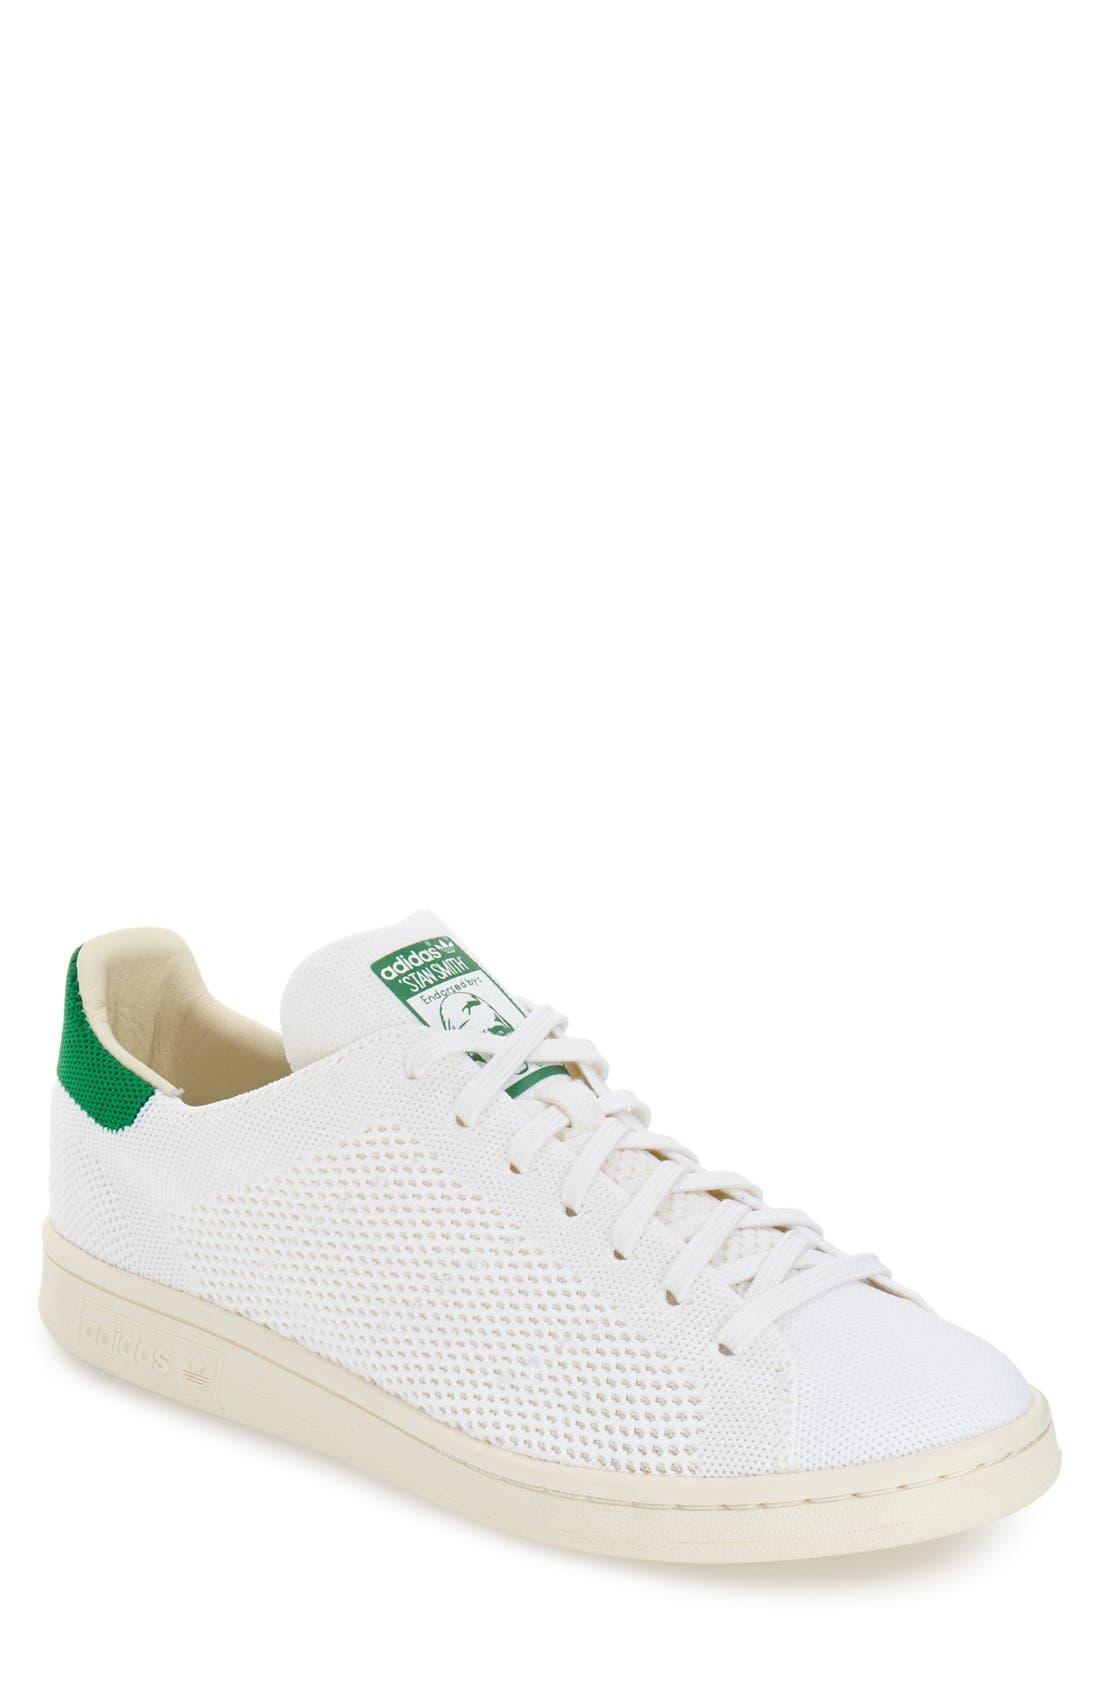 ADIDAS 'Stan Smith OG Primeknit' Sneaker, Main, color, 101